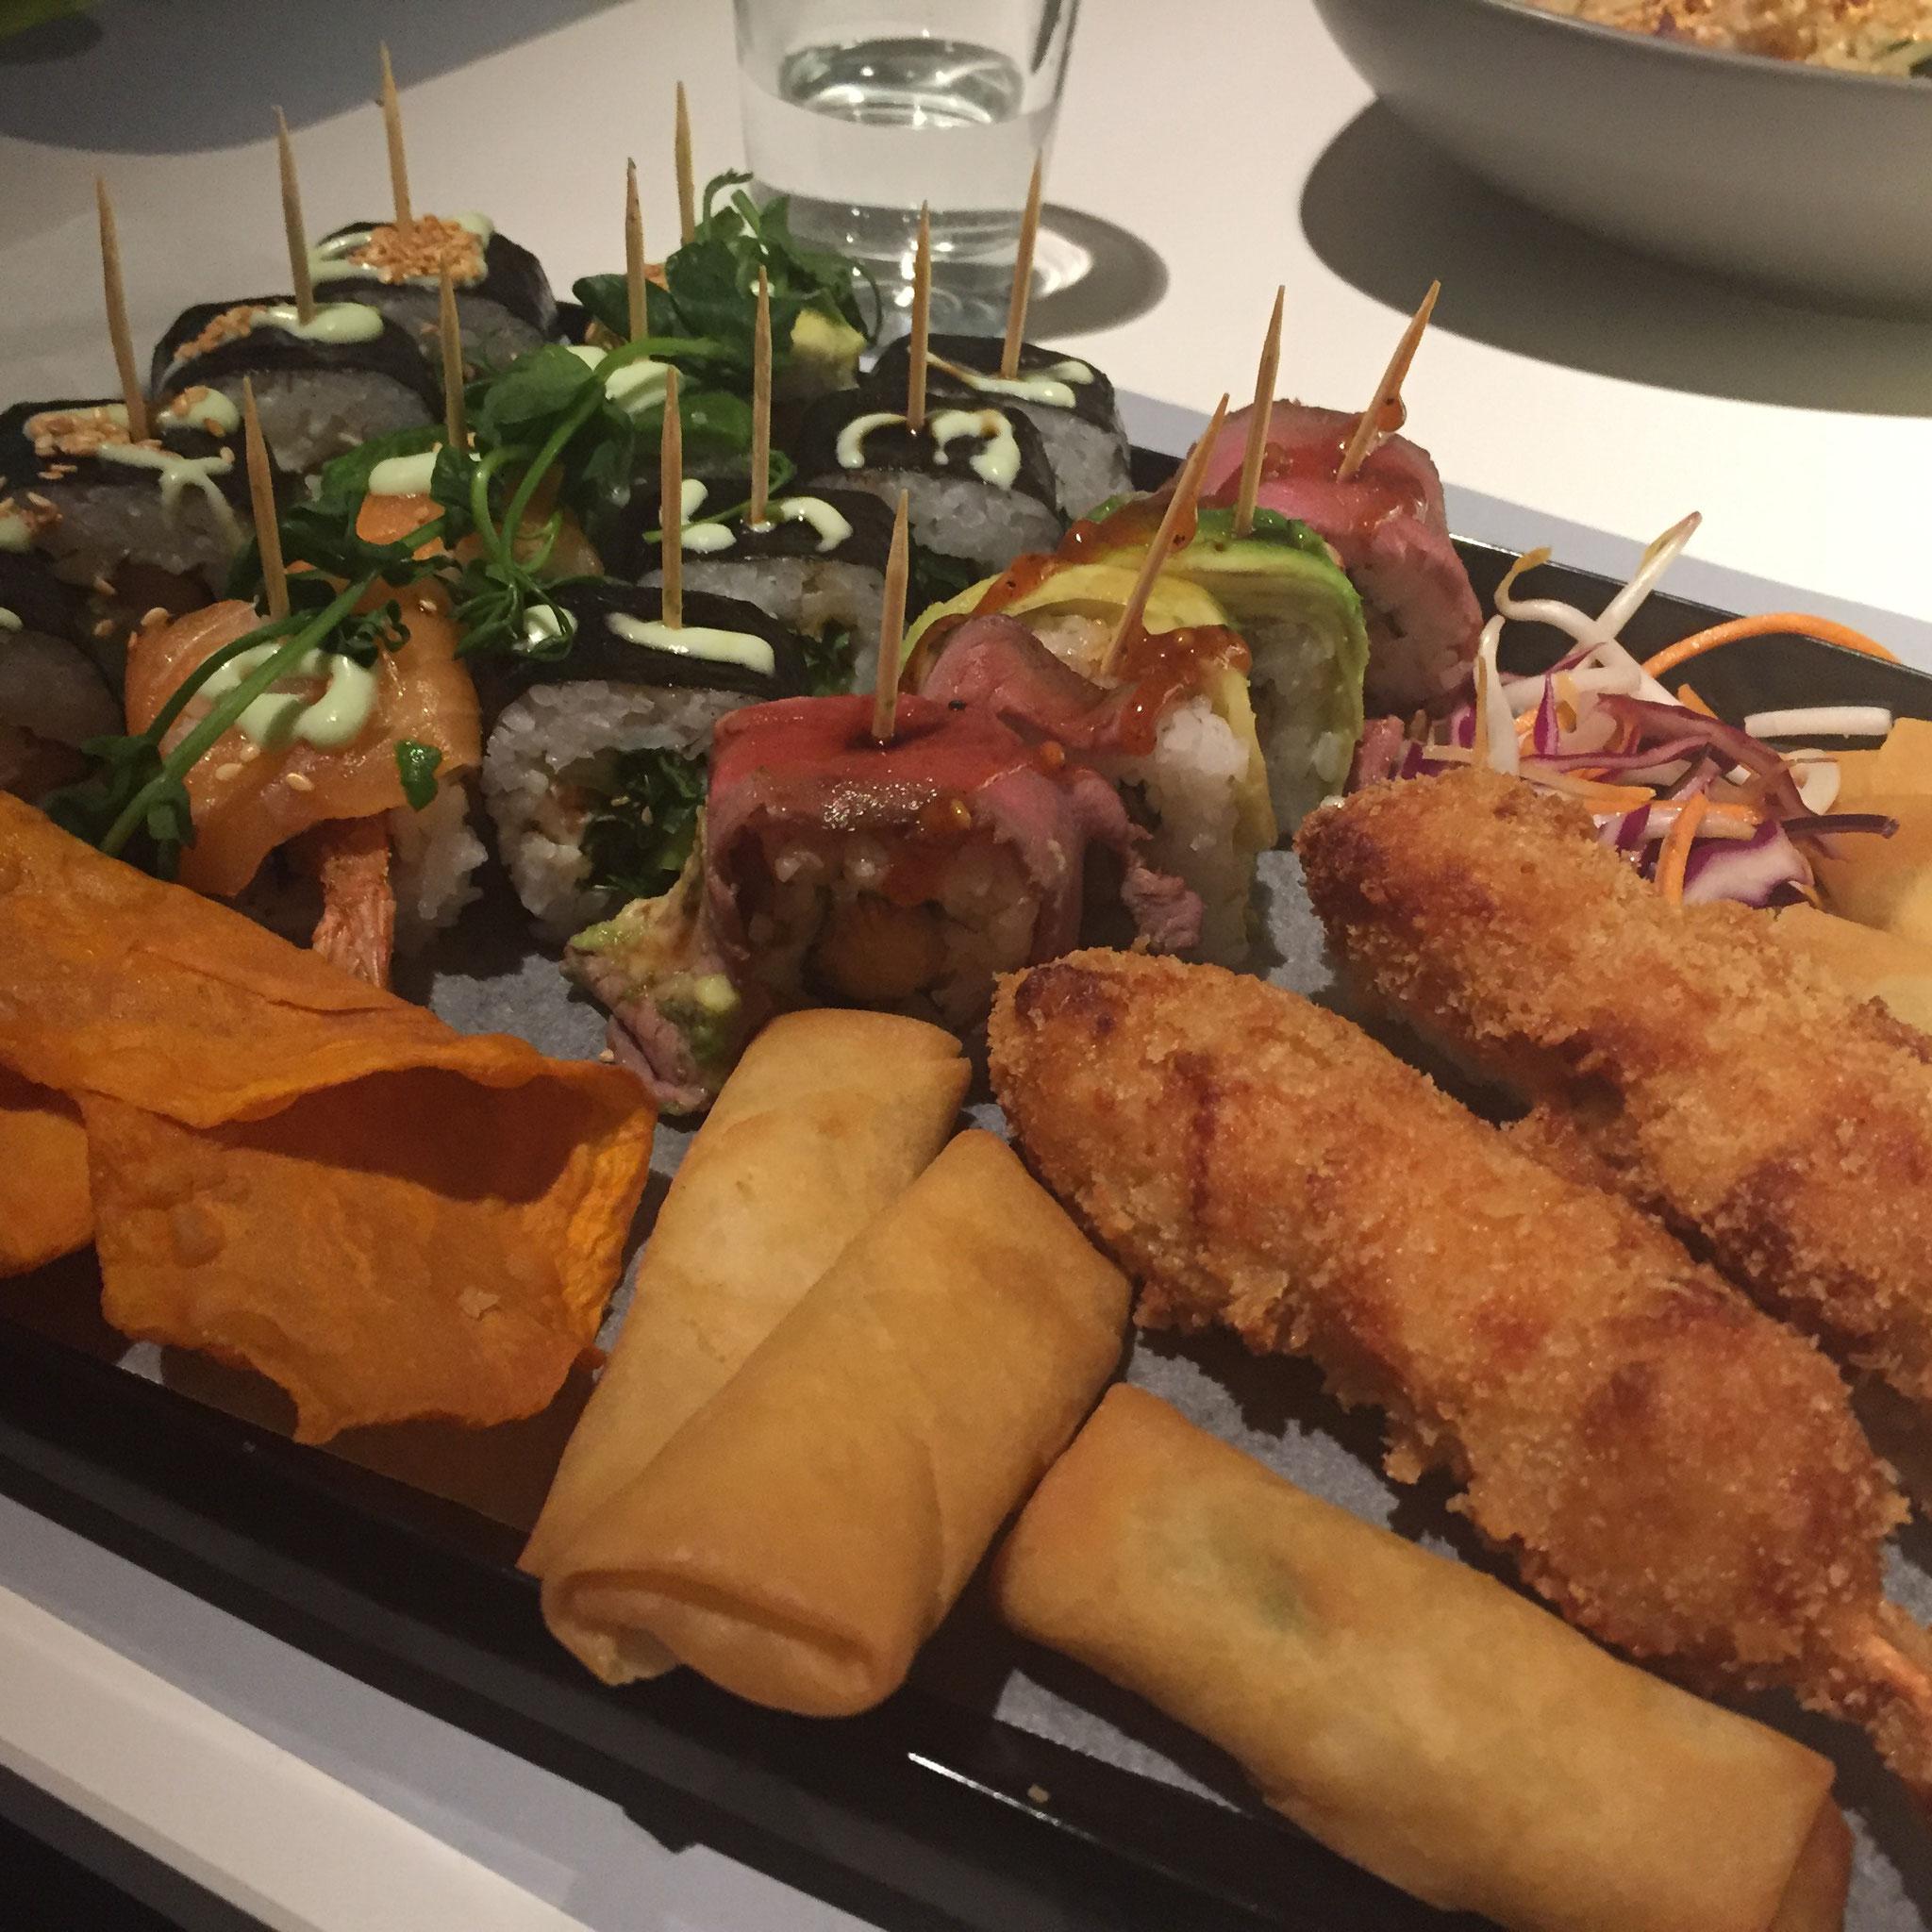 GinYuu in Koeln - Phoenix Roll Sushi - Kushi Katsu Sticks - Frühlingsrollen